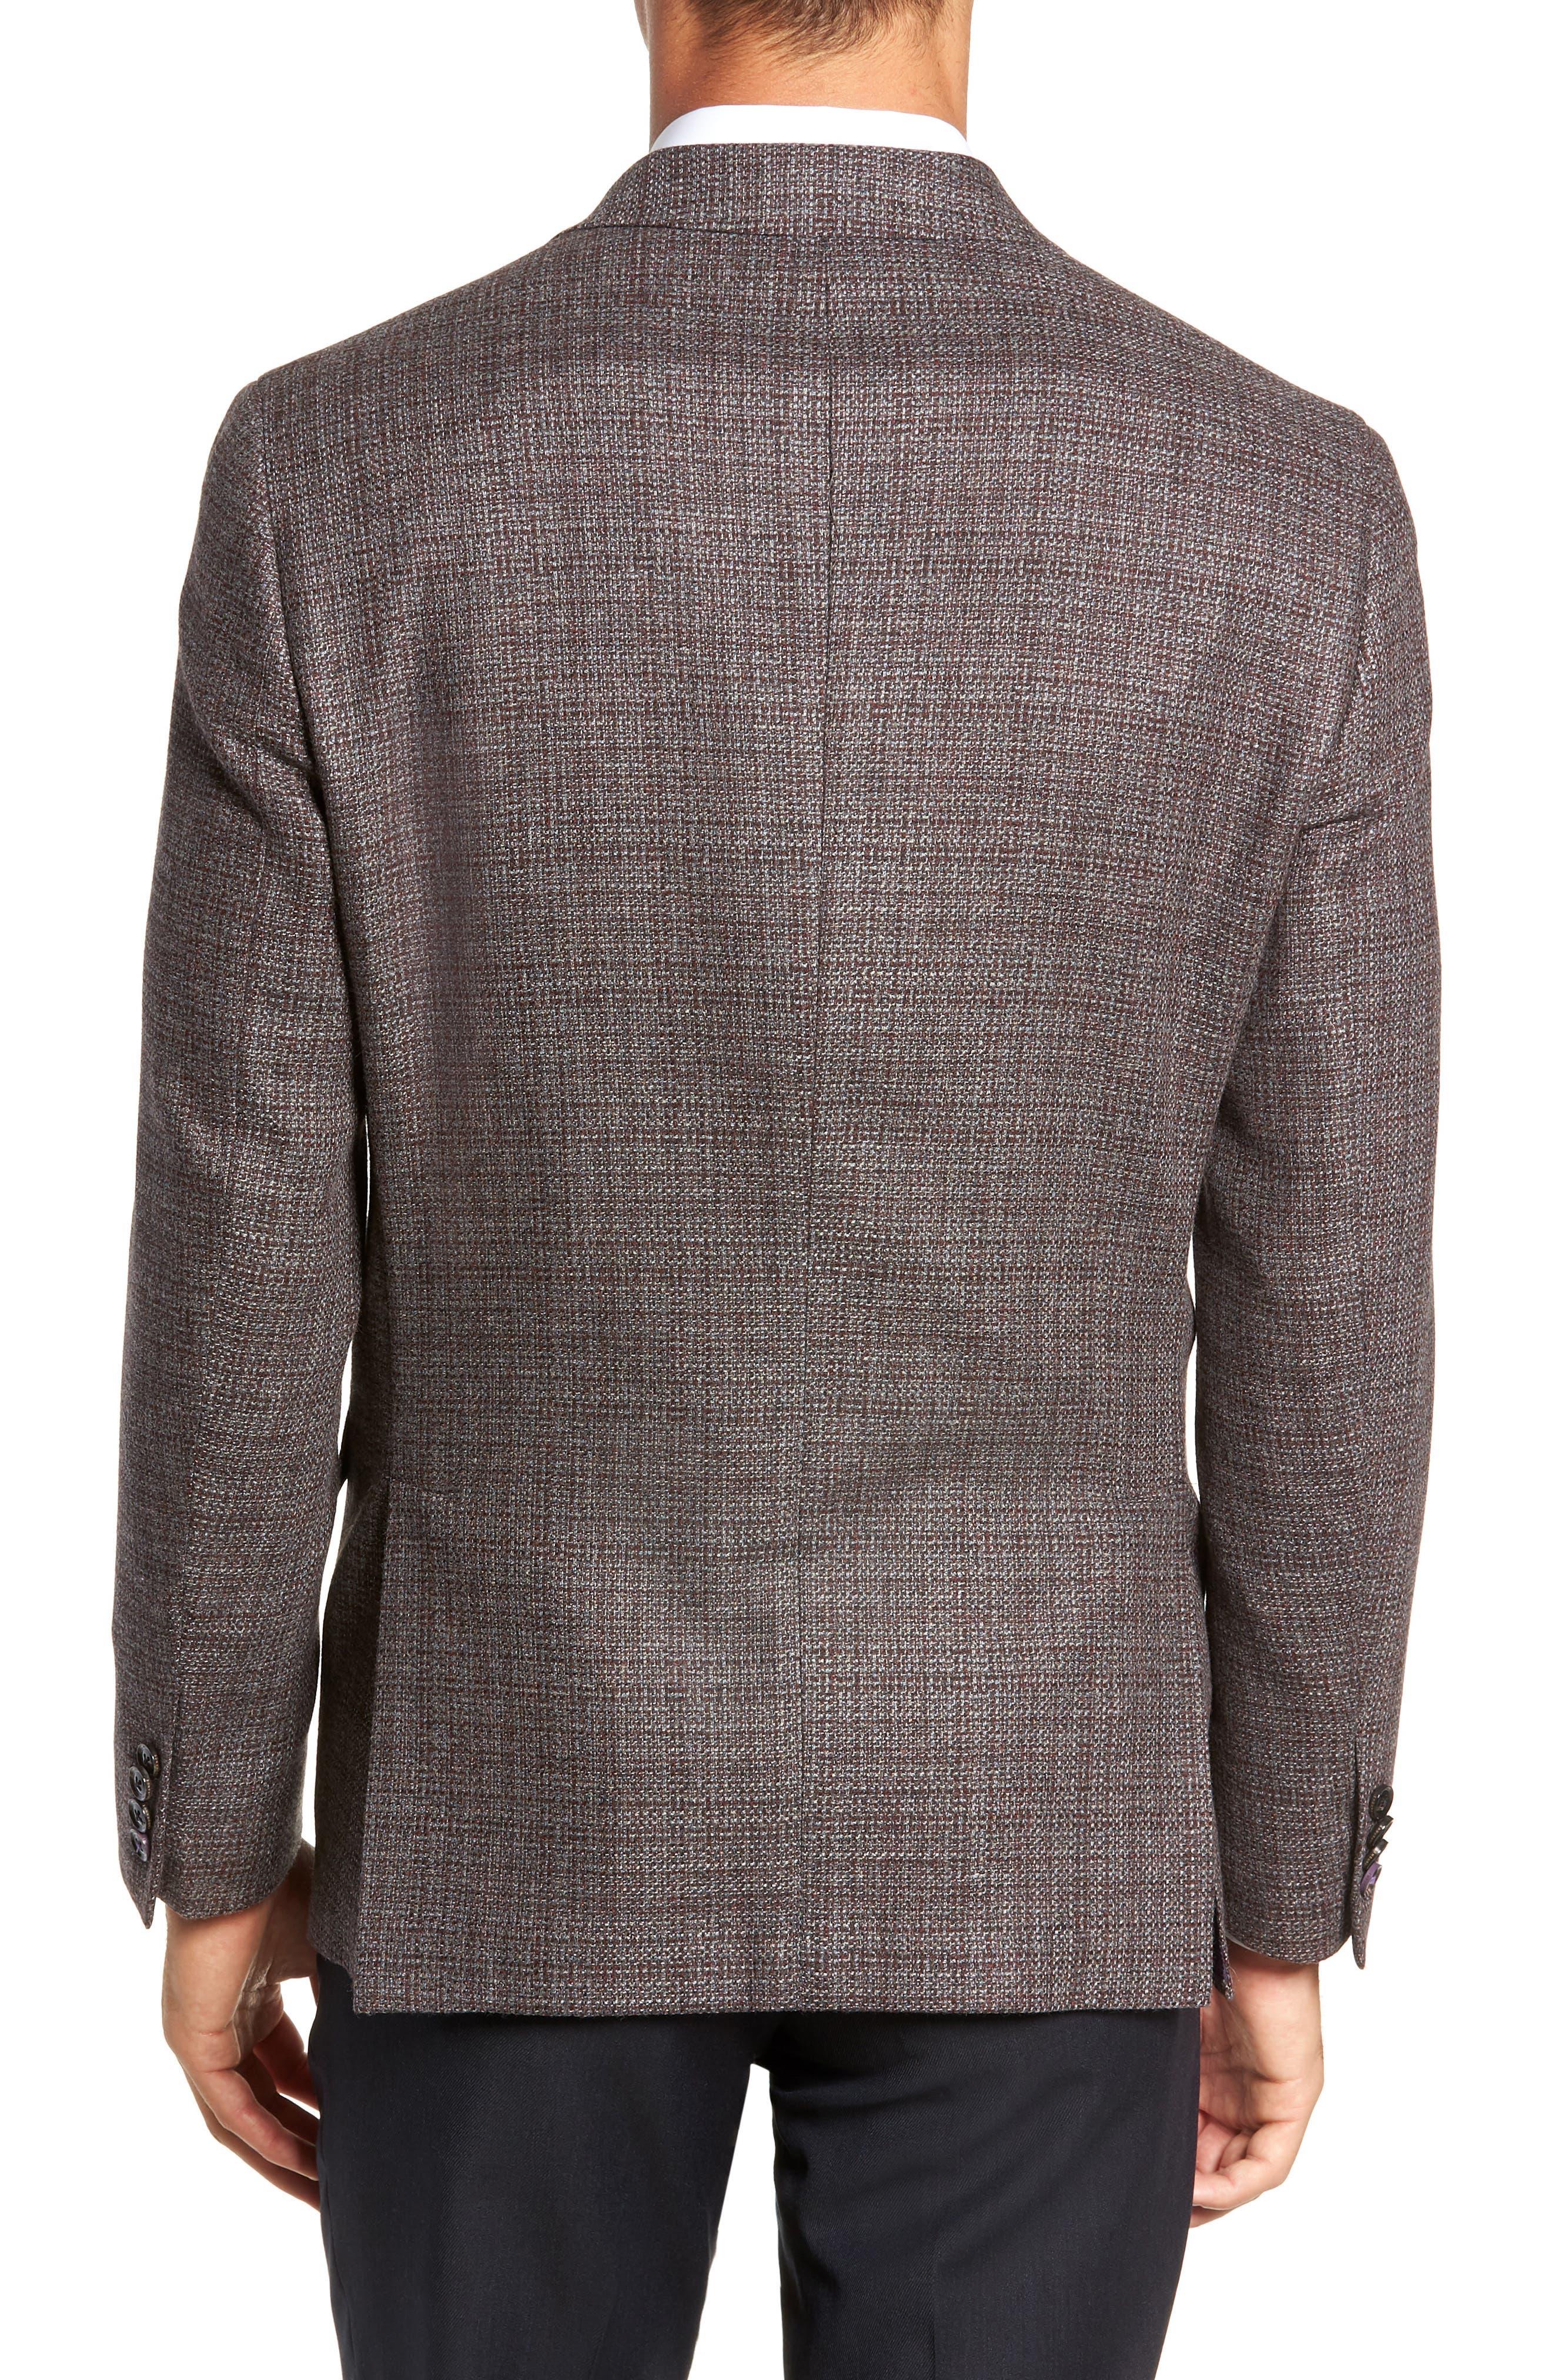 Konan 2B Trim Fit Textured Sport Coat,                             Alternate thumbnail 2, color,                             RED